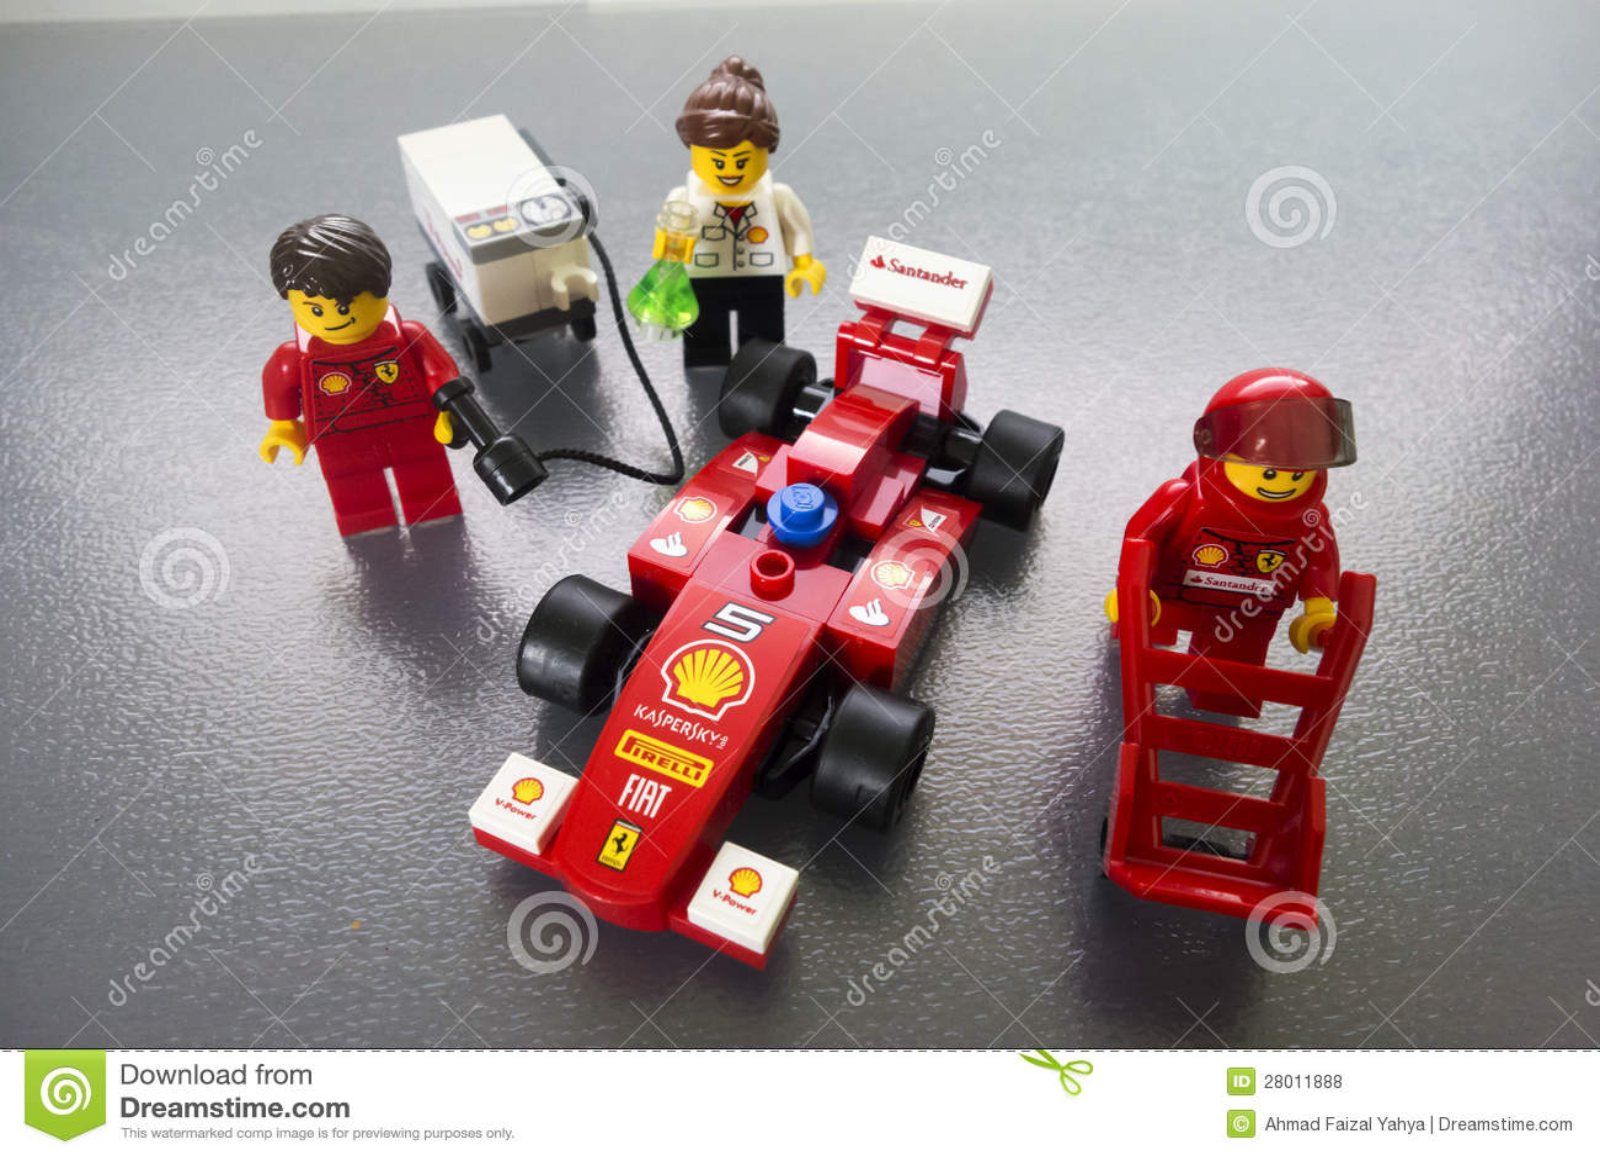 Shell Ferrari Lego Toys Editorial Stock Photo Image